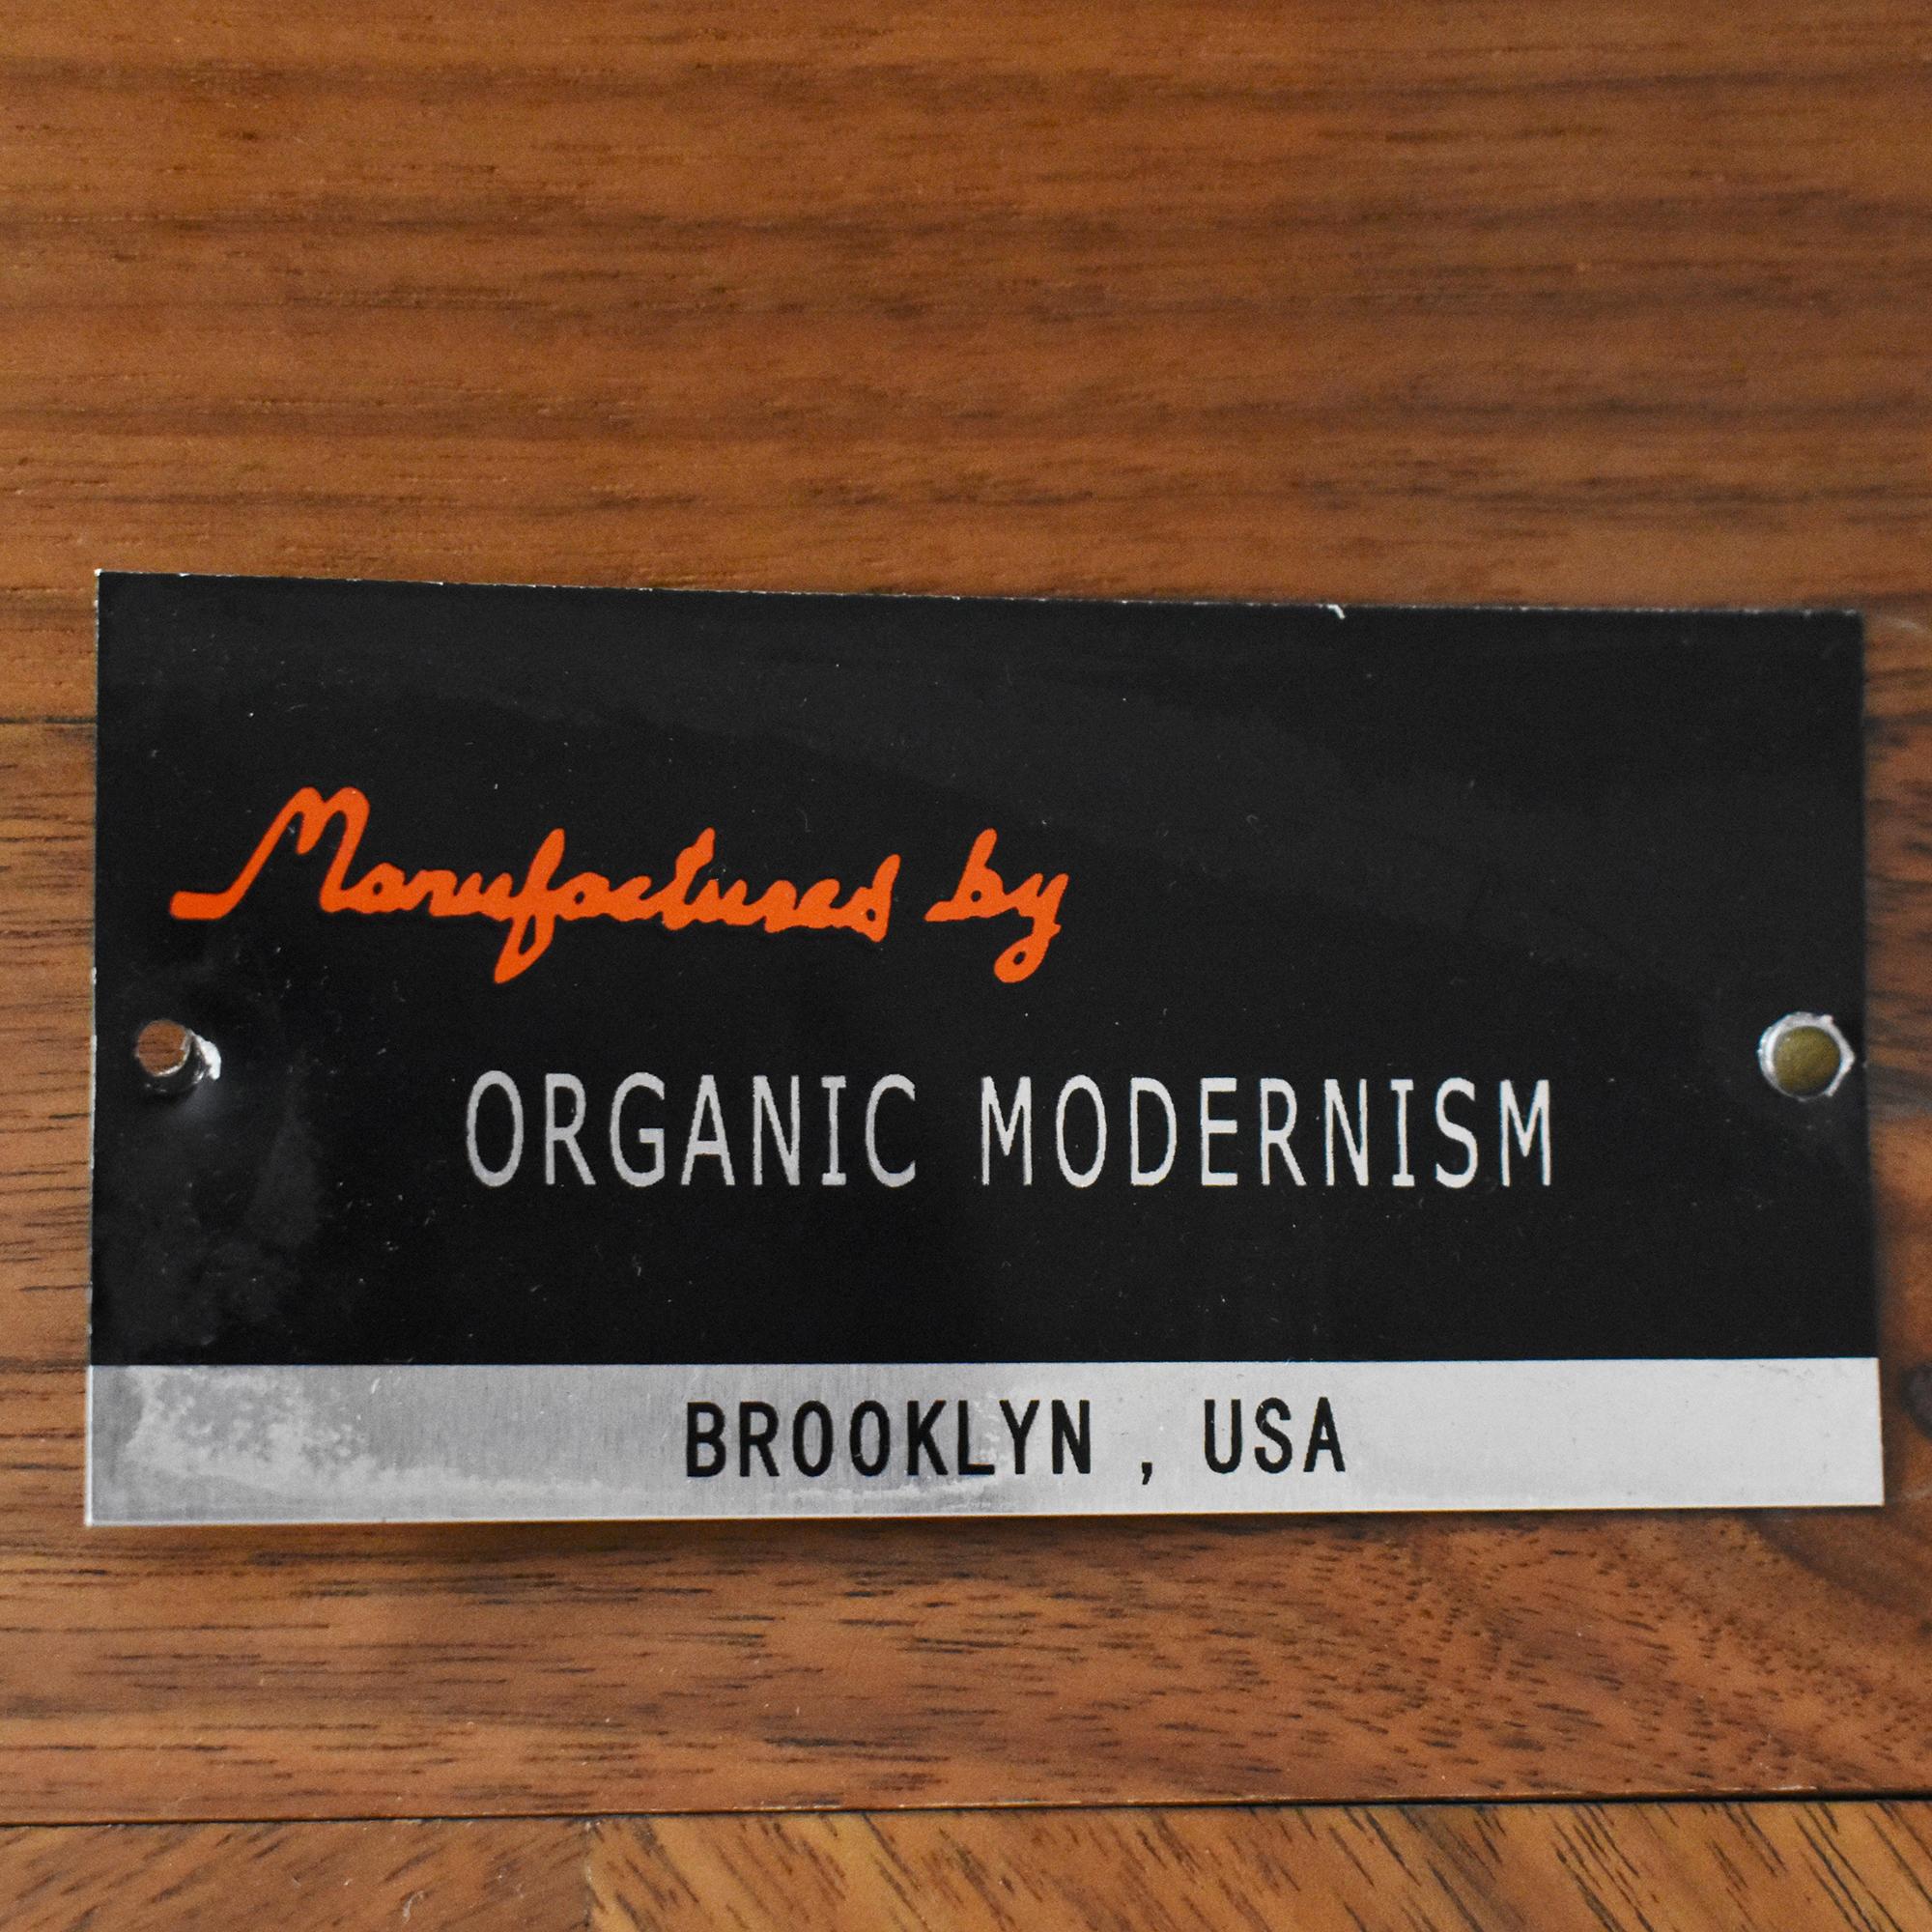 buy Organic Modernism Okto Round Dining Table Organic Modernism Tables